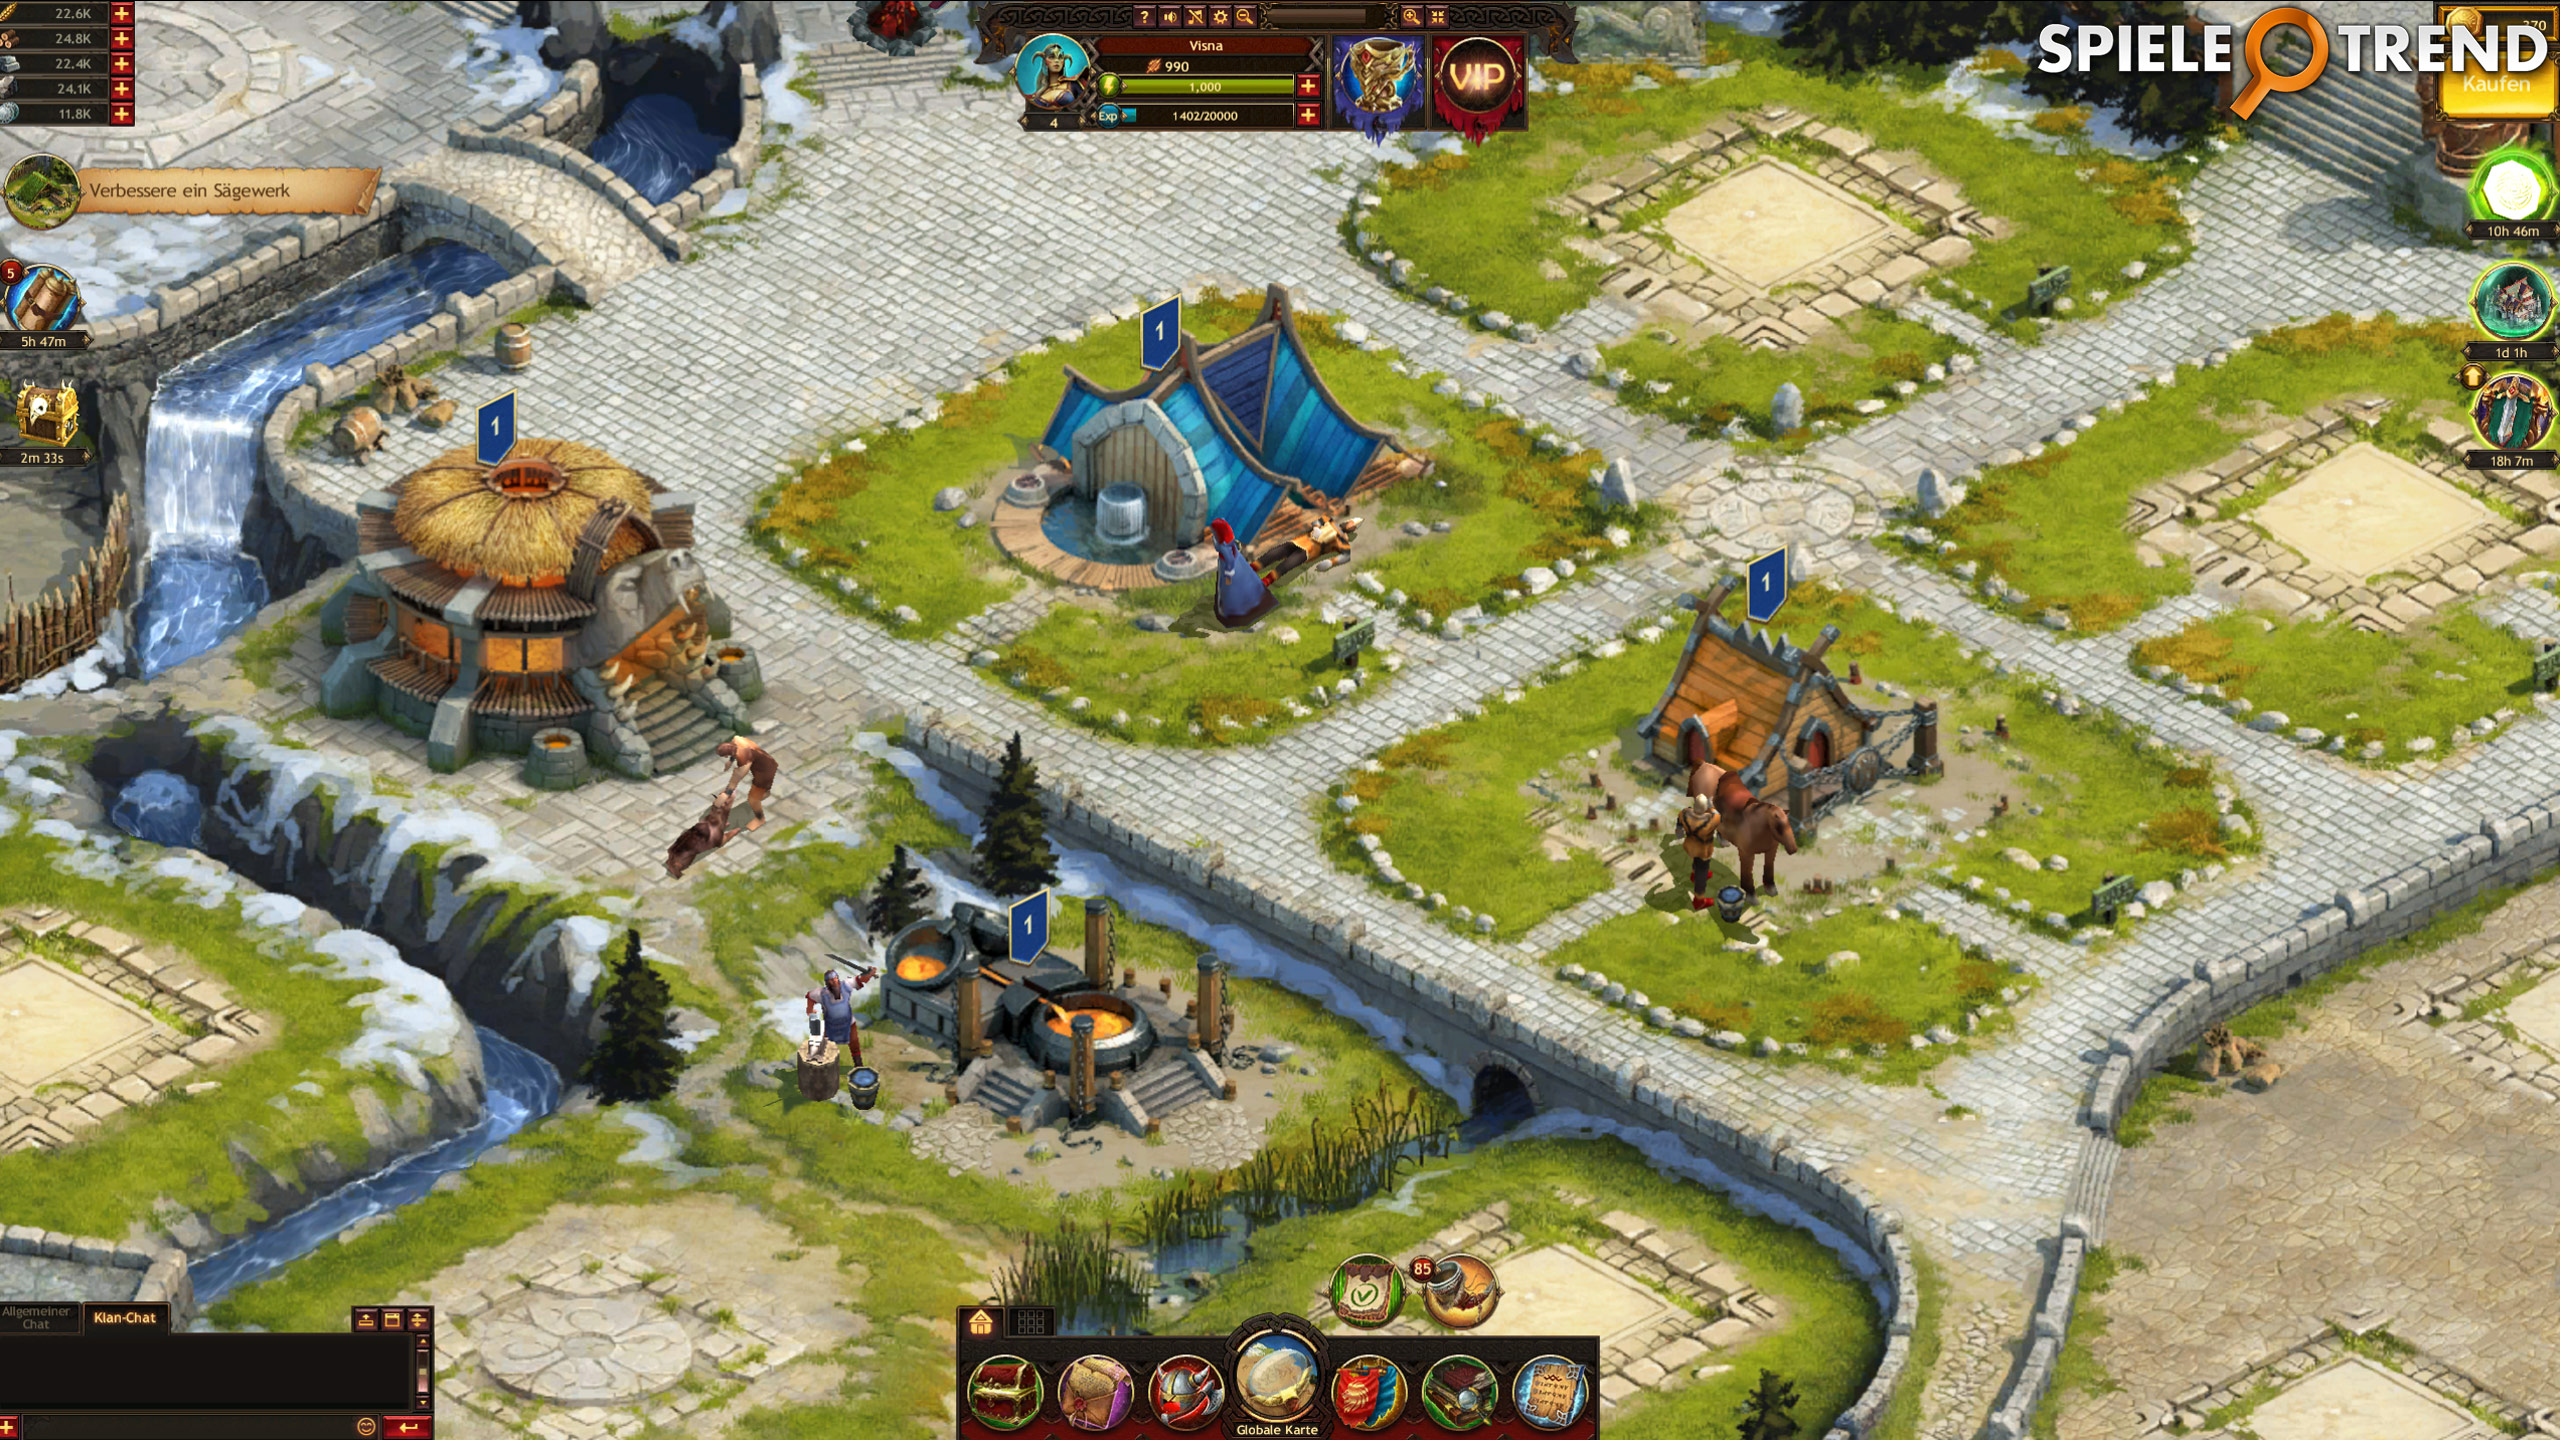 Vikinger Spiel